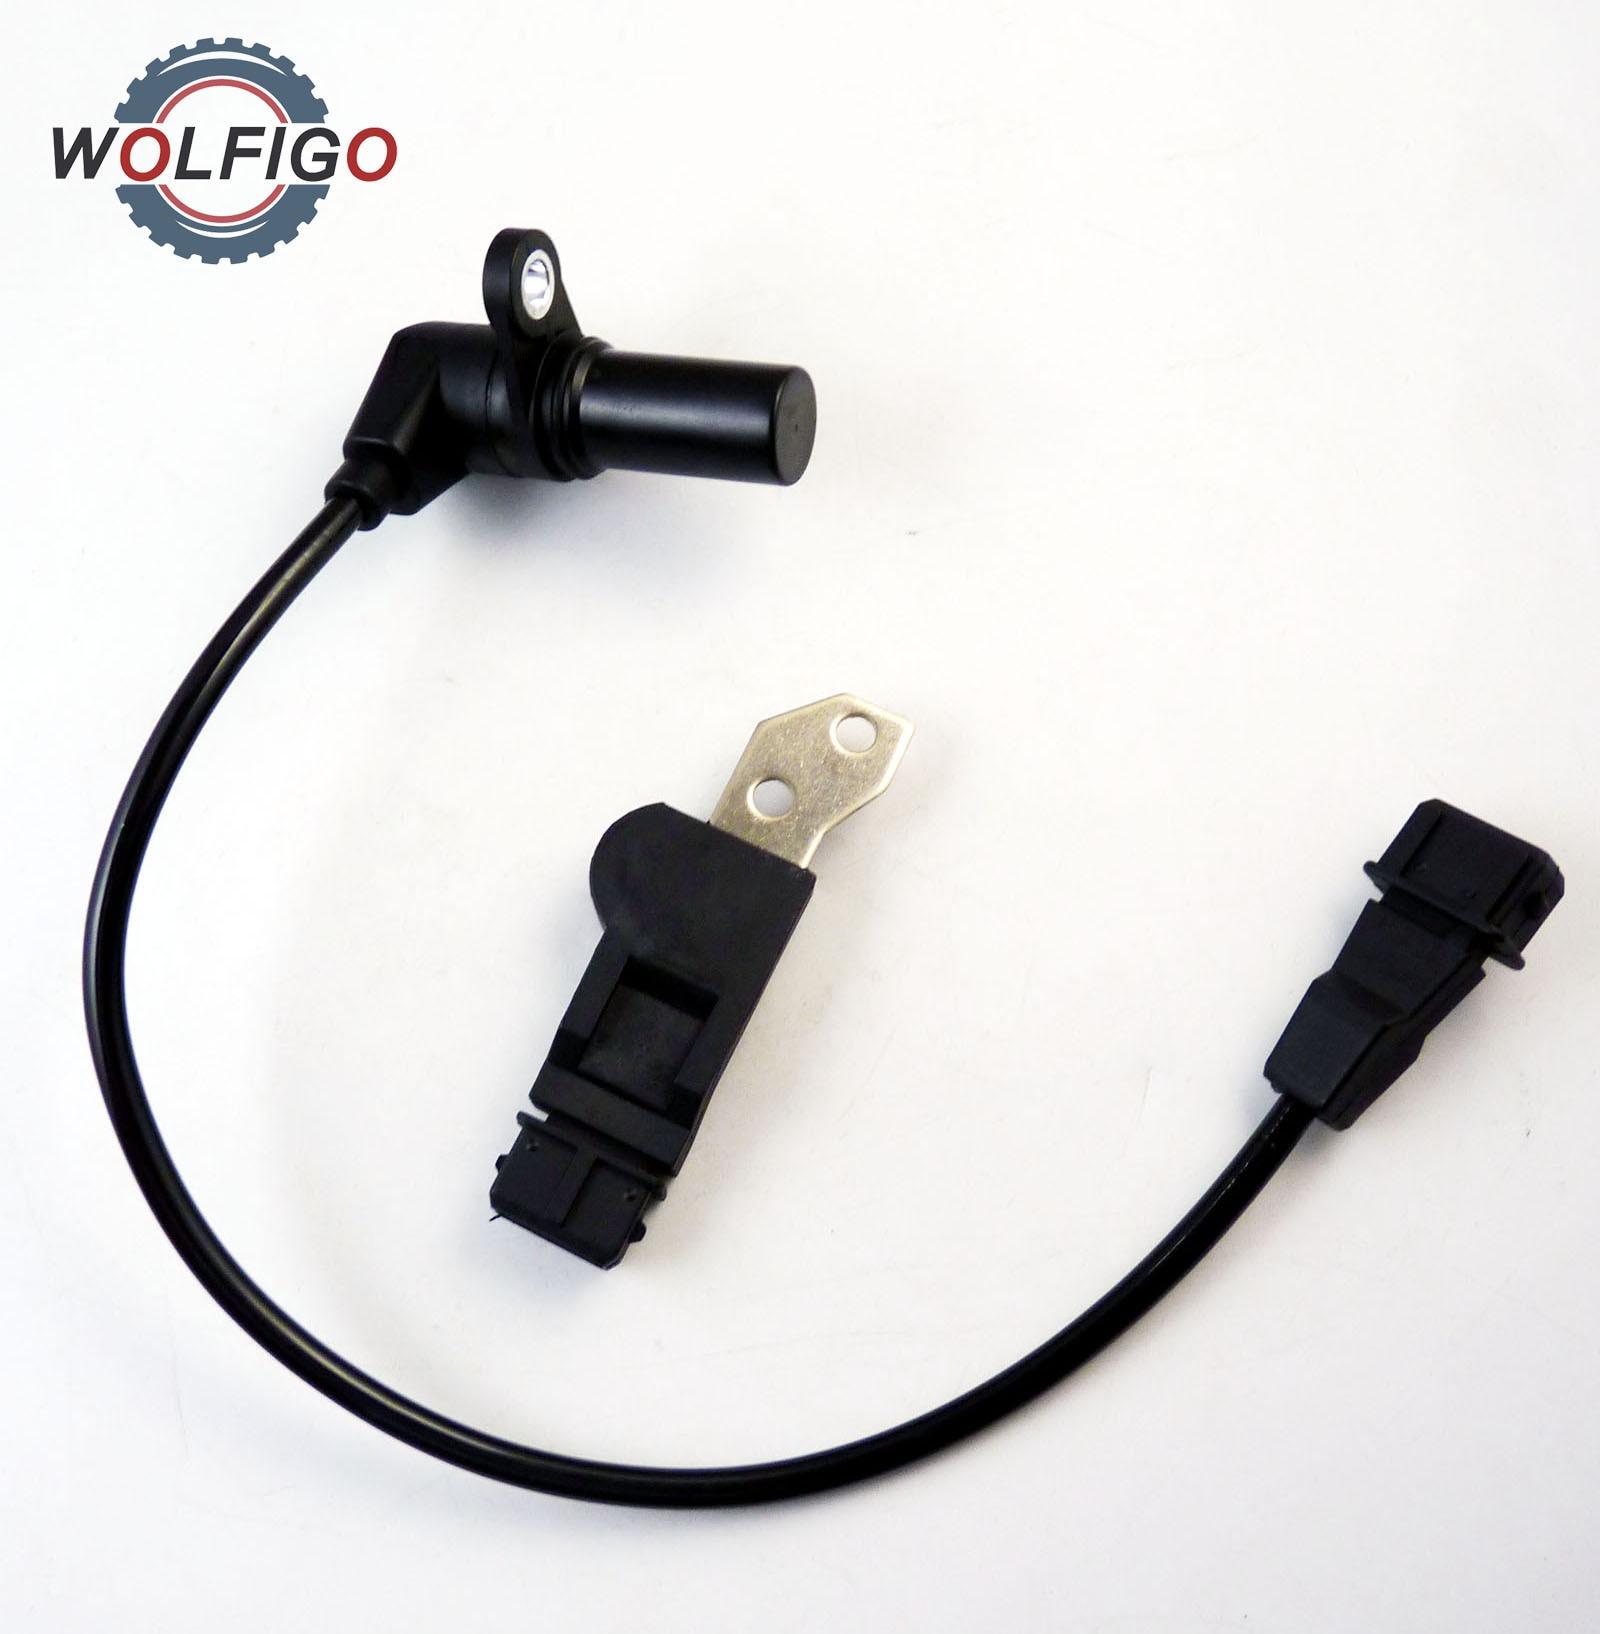 Aliexpress.com : Buy WOLFIGO New Crankshaft Camshaft